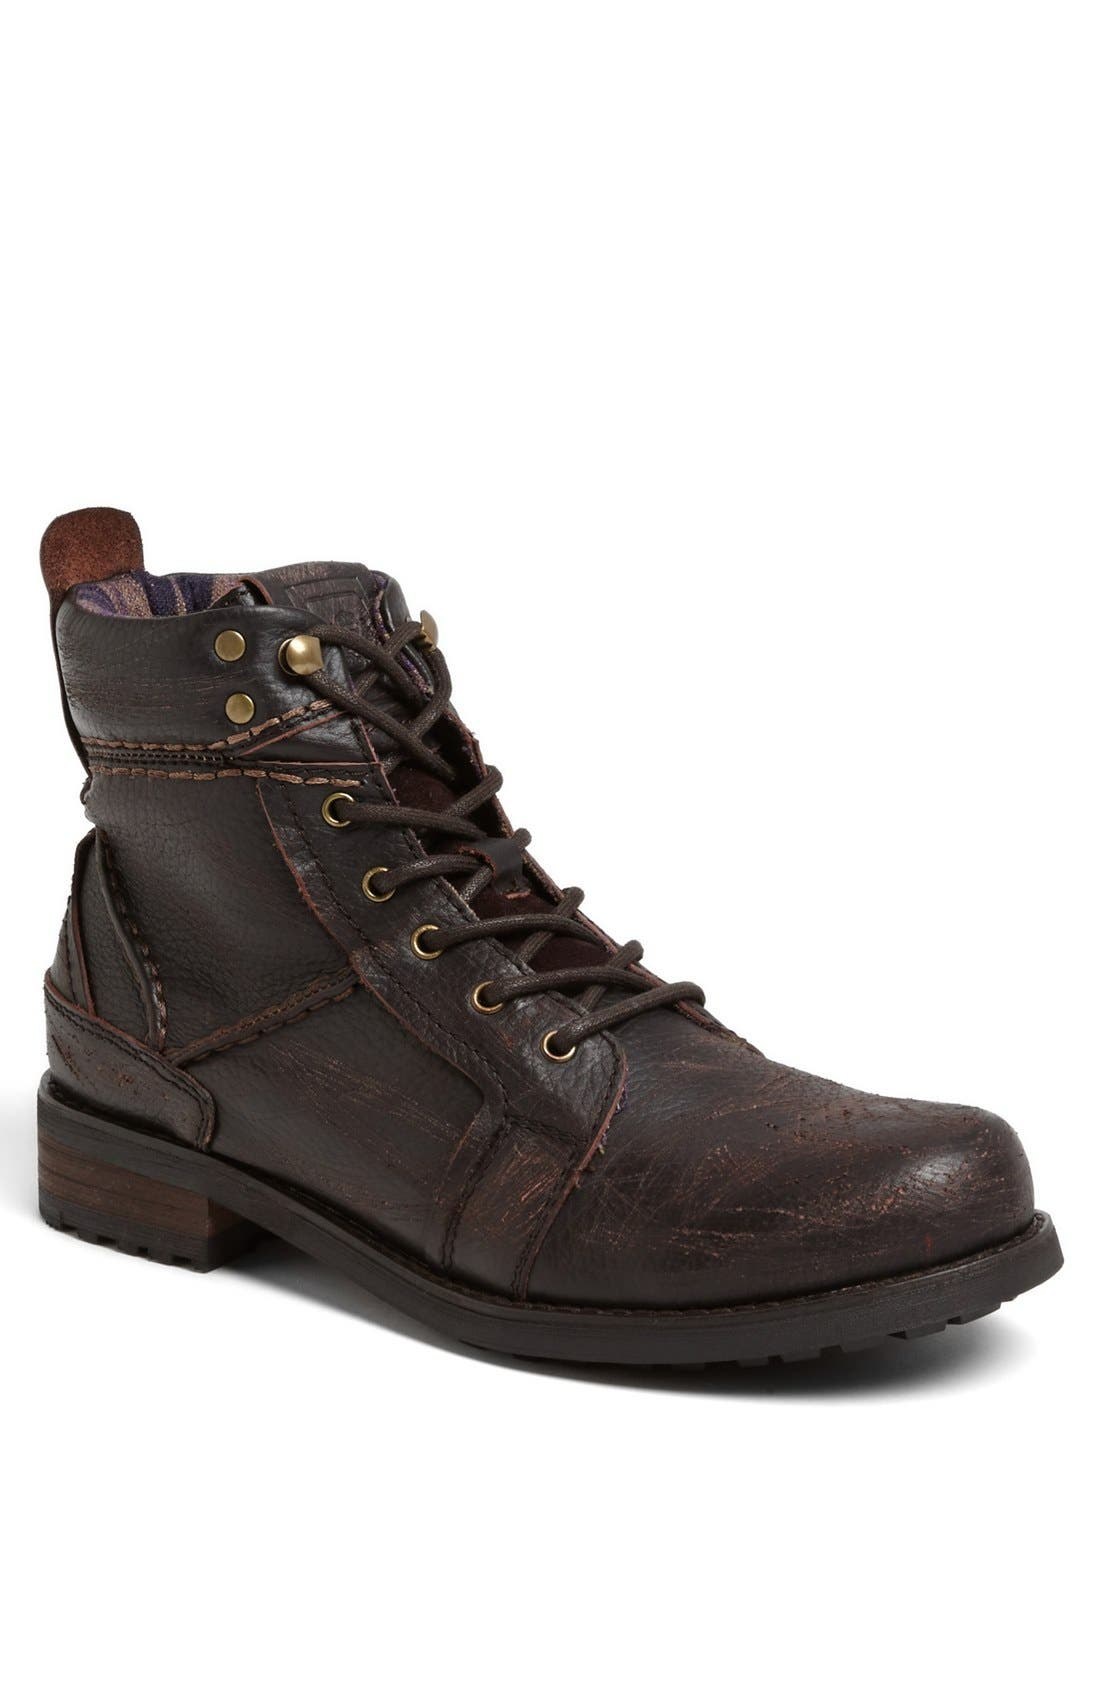 Main Image - ZIGIny 'Catcher' Plain Toe Boot